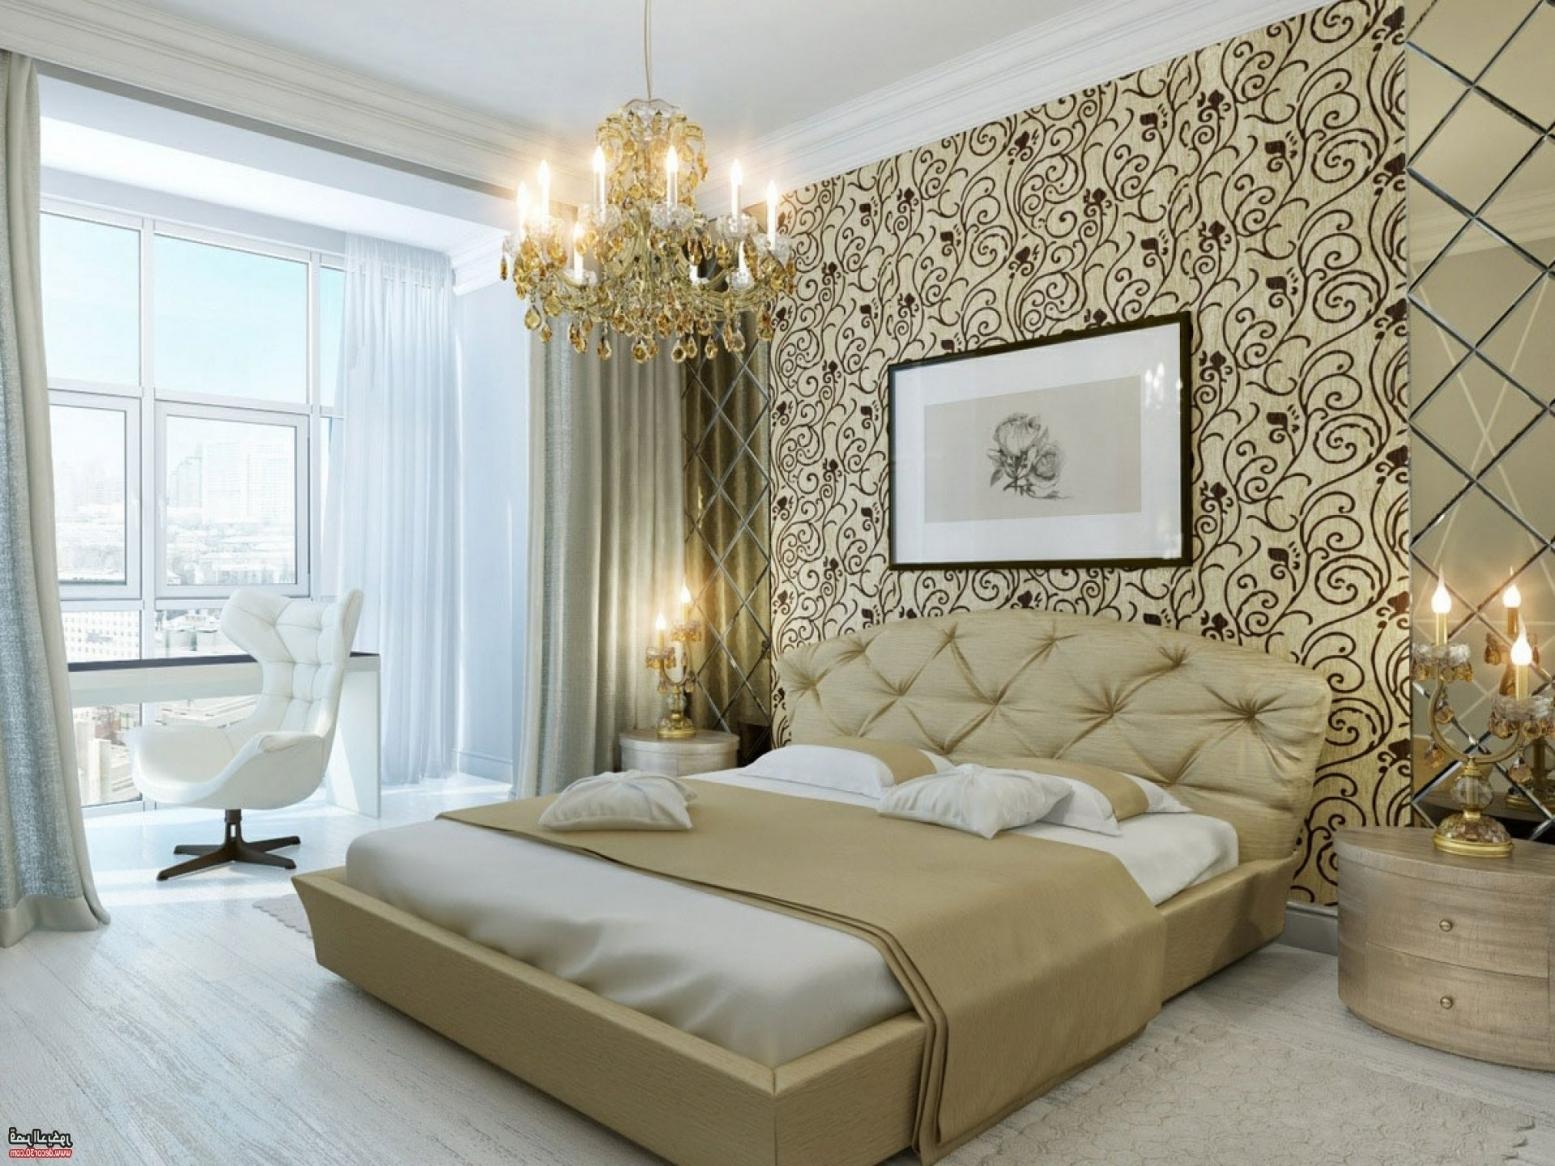 ورق جدران غرف نوم احدث ديكورات غرف النوم بورق الجدران بنات كيوت